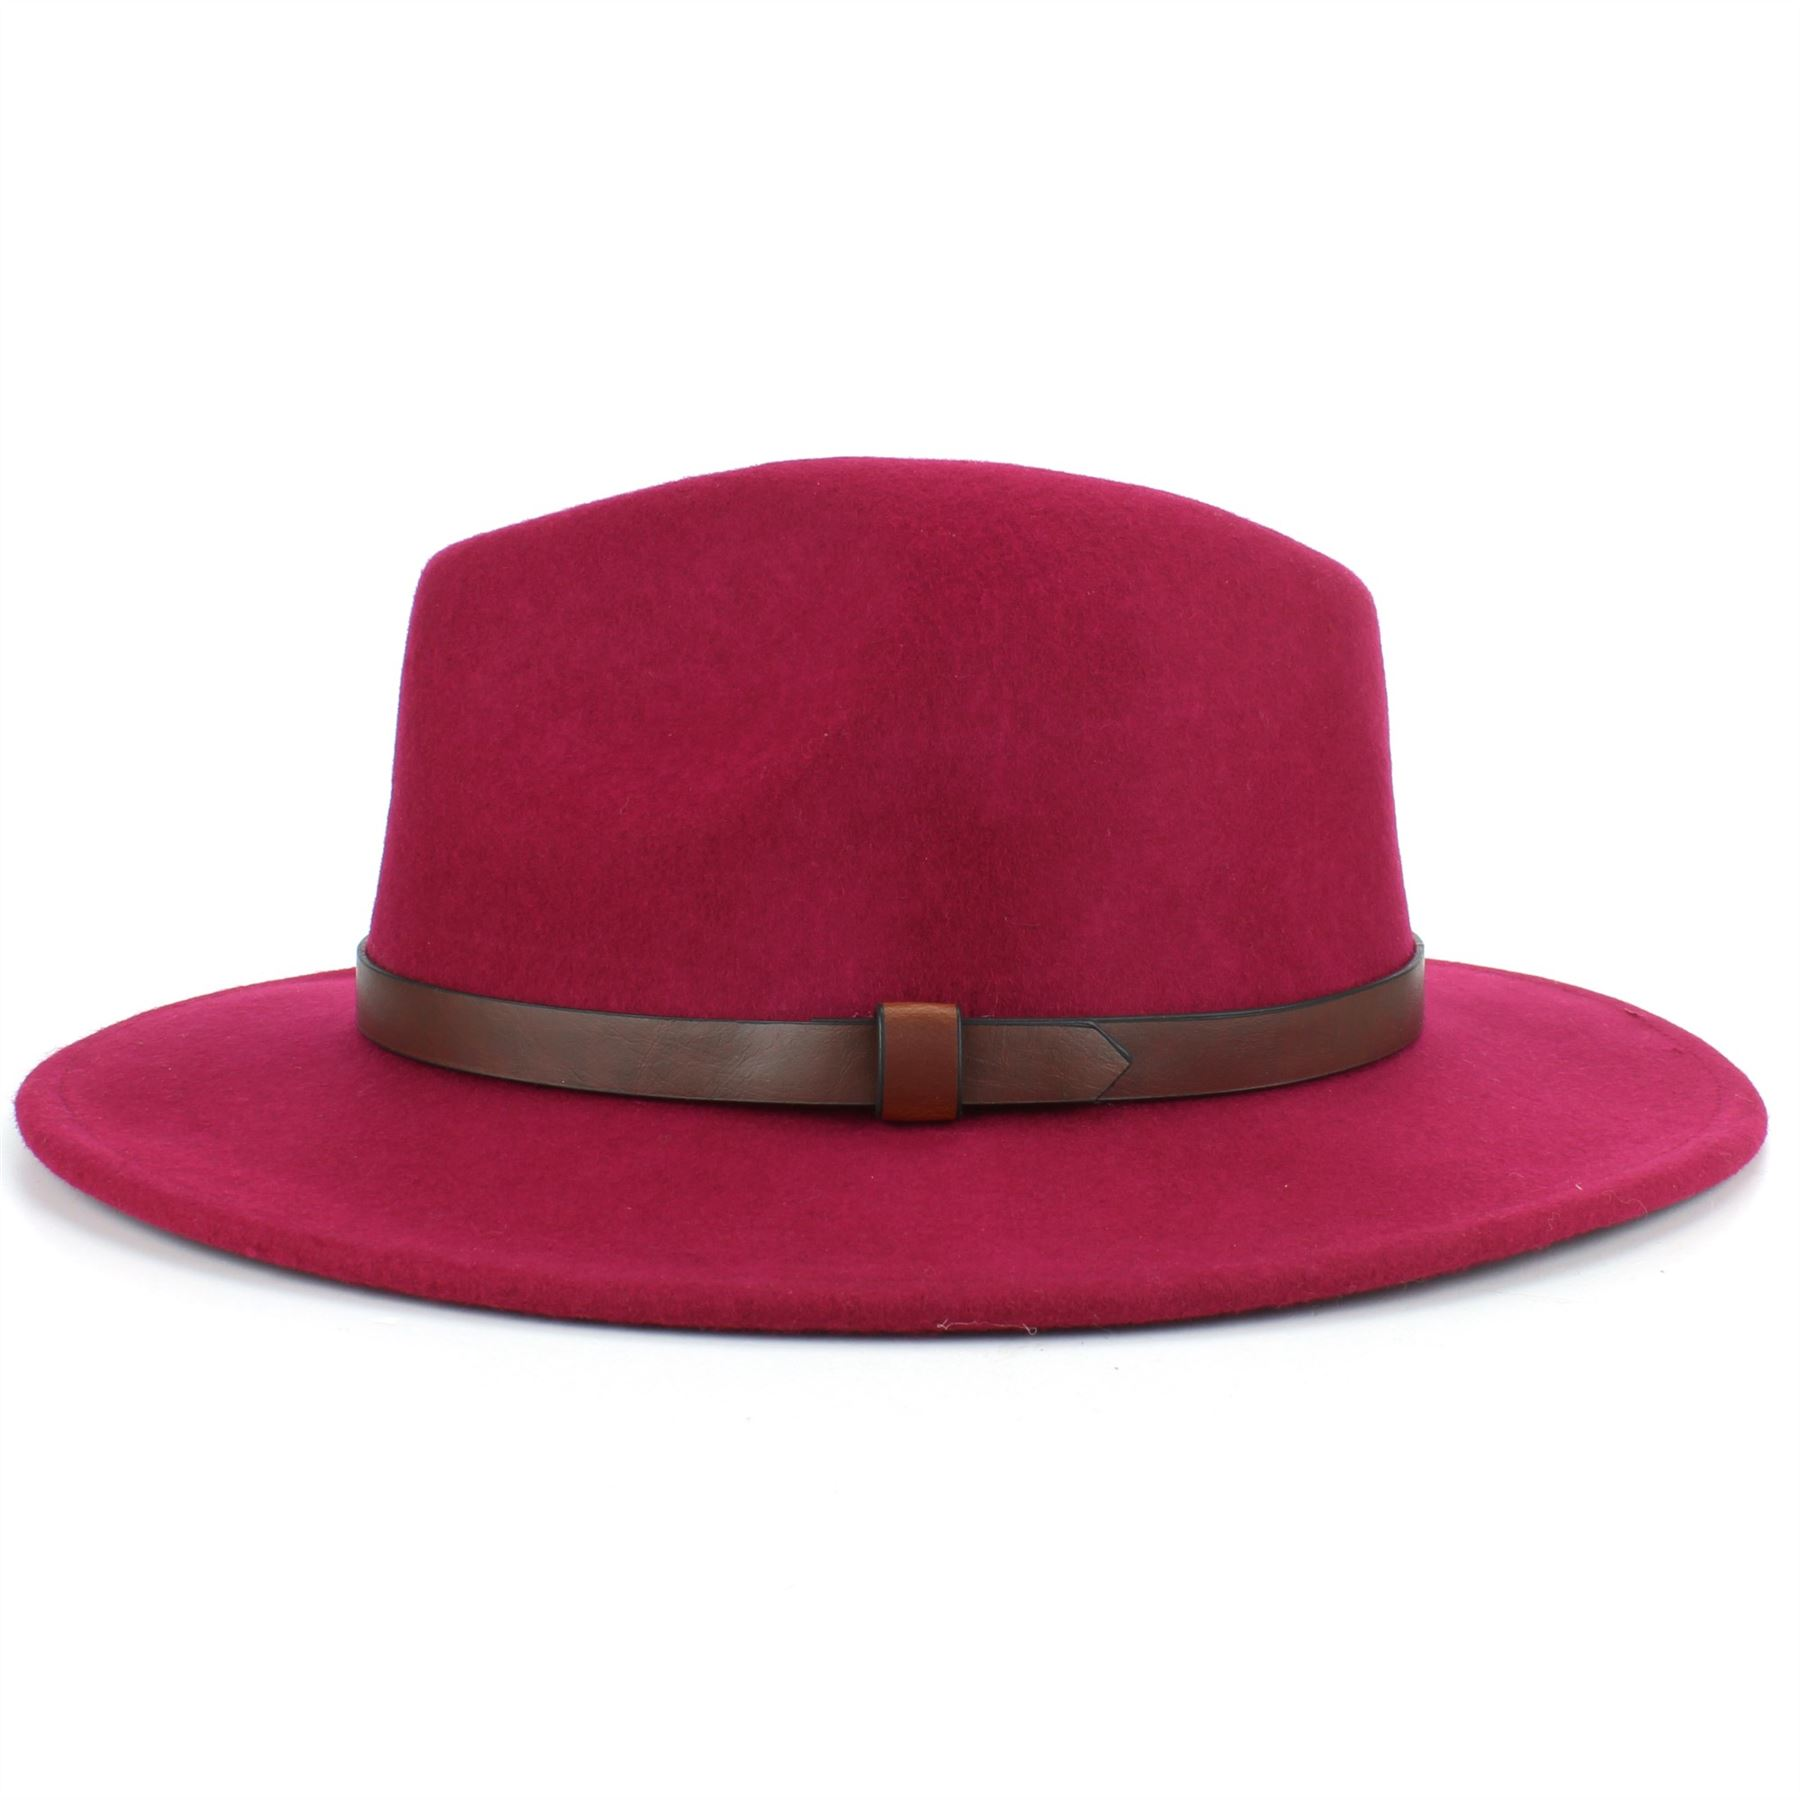 Fedora Hat Wool Felt Hawkins Feather Band Trilby Ladies Men Travel Brim Travel